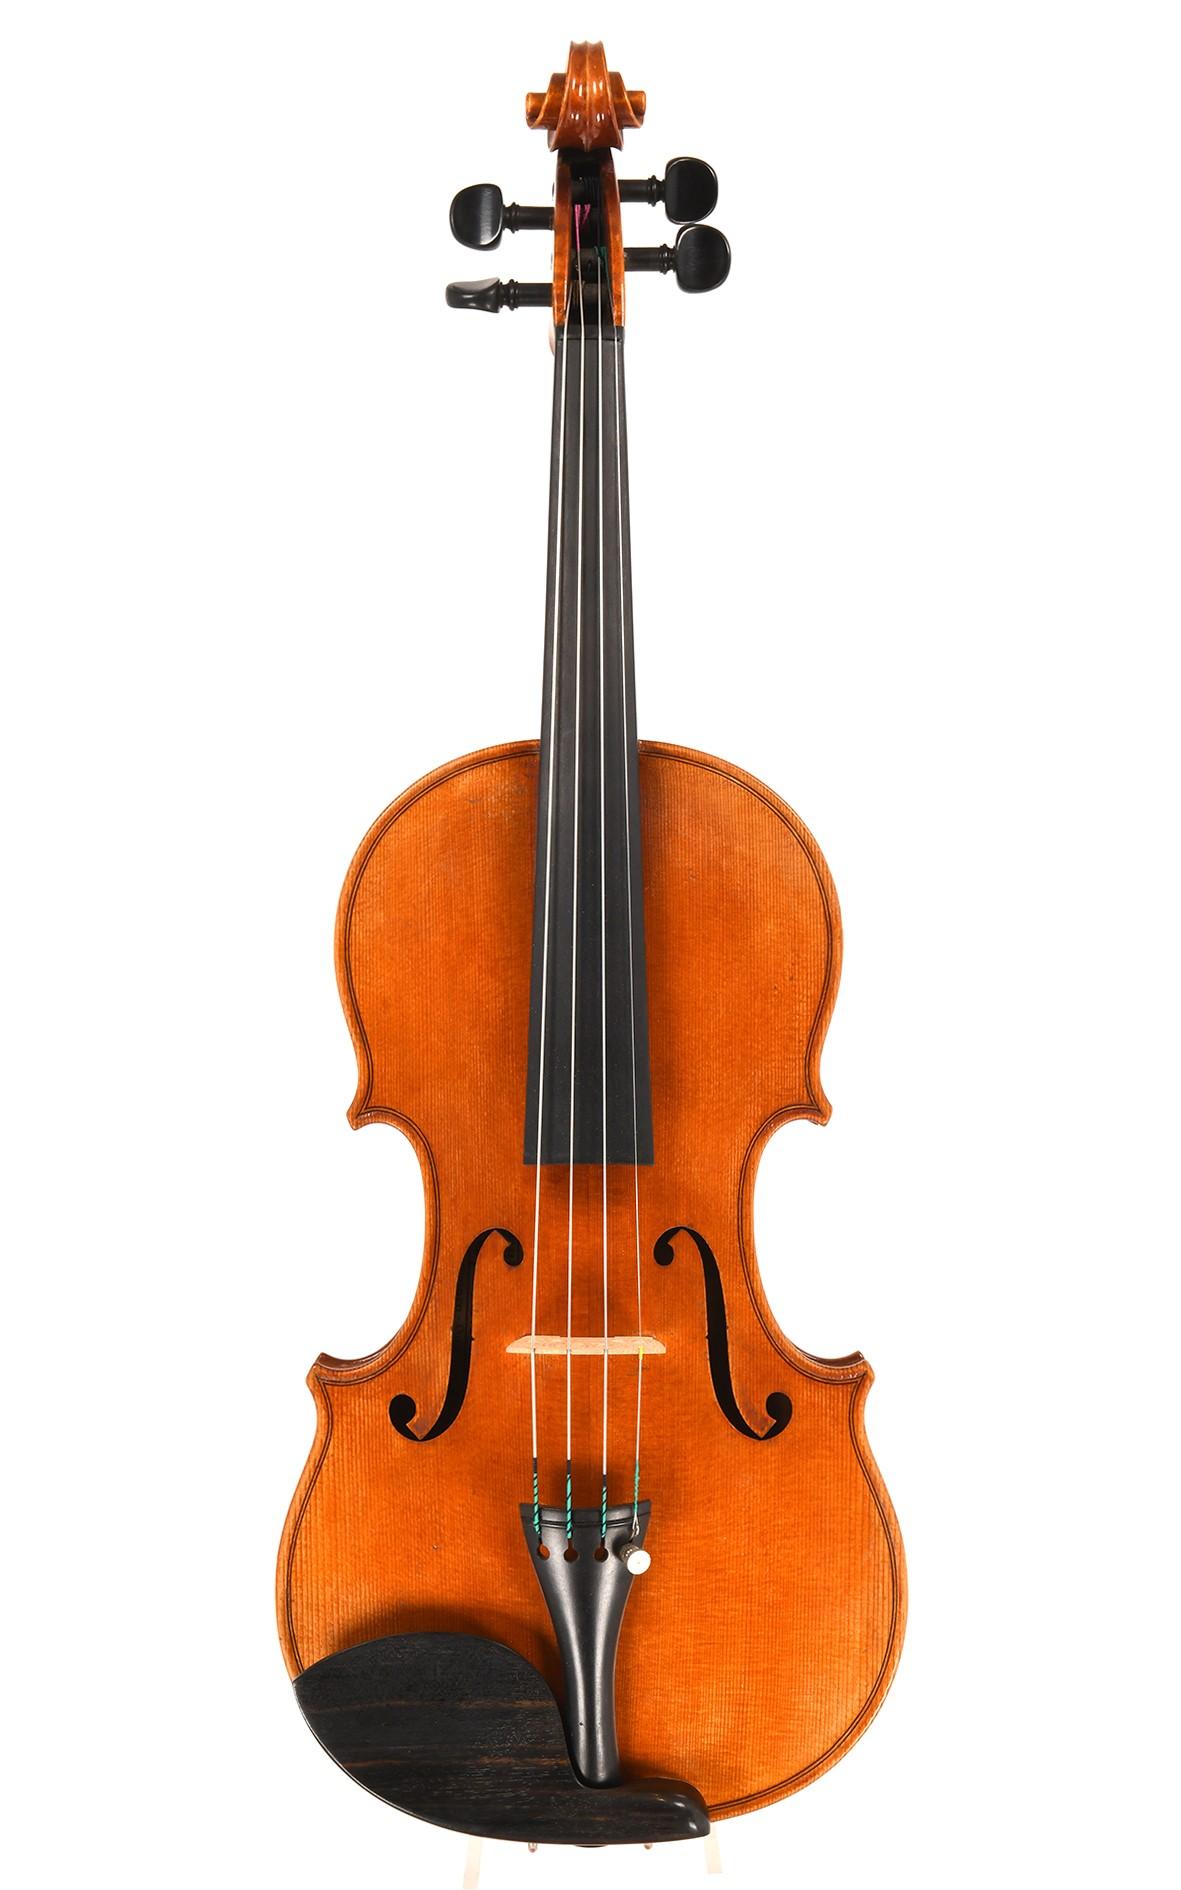 Professional violin by Paul Kochendörfer, Stuttgart 1940